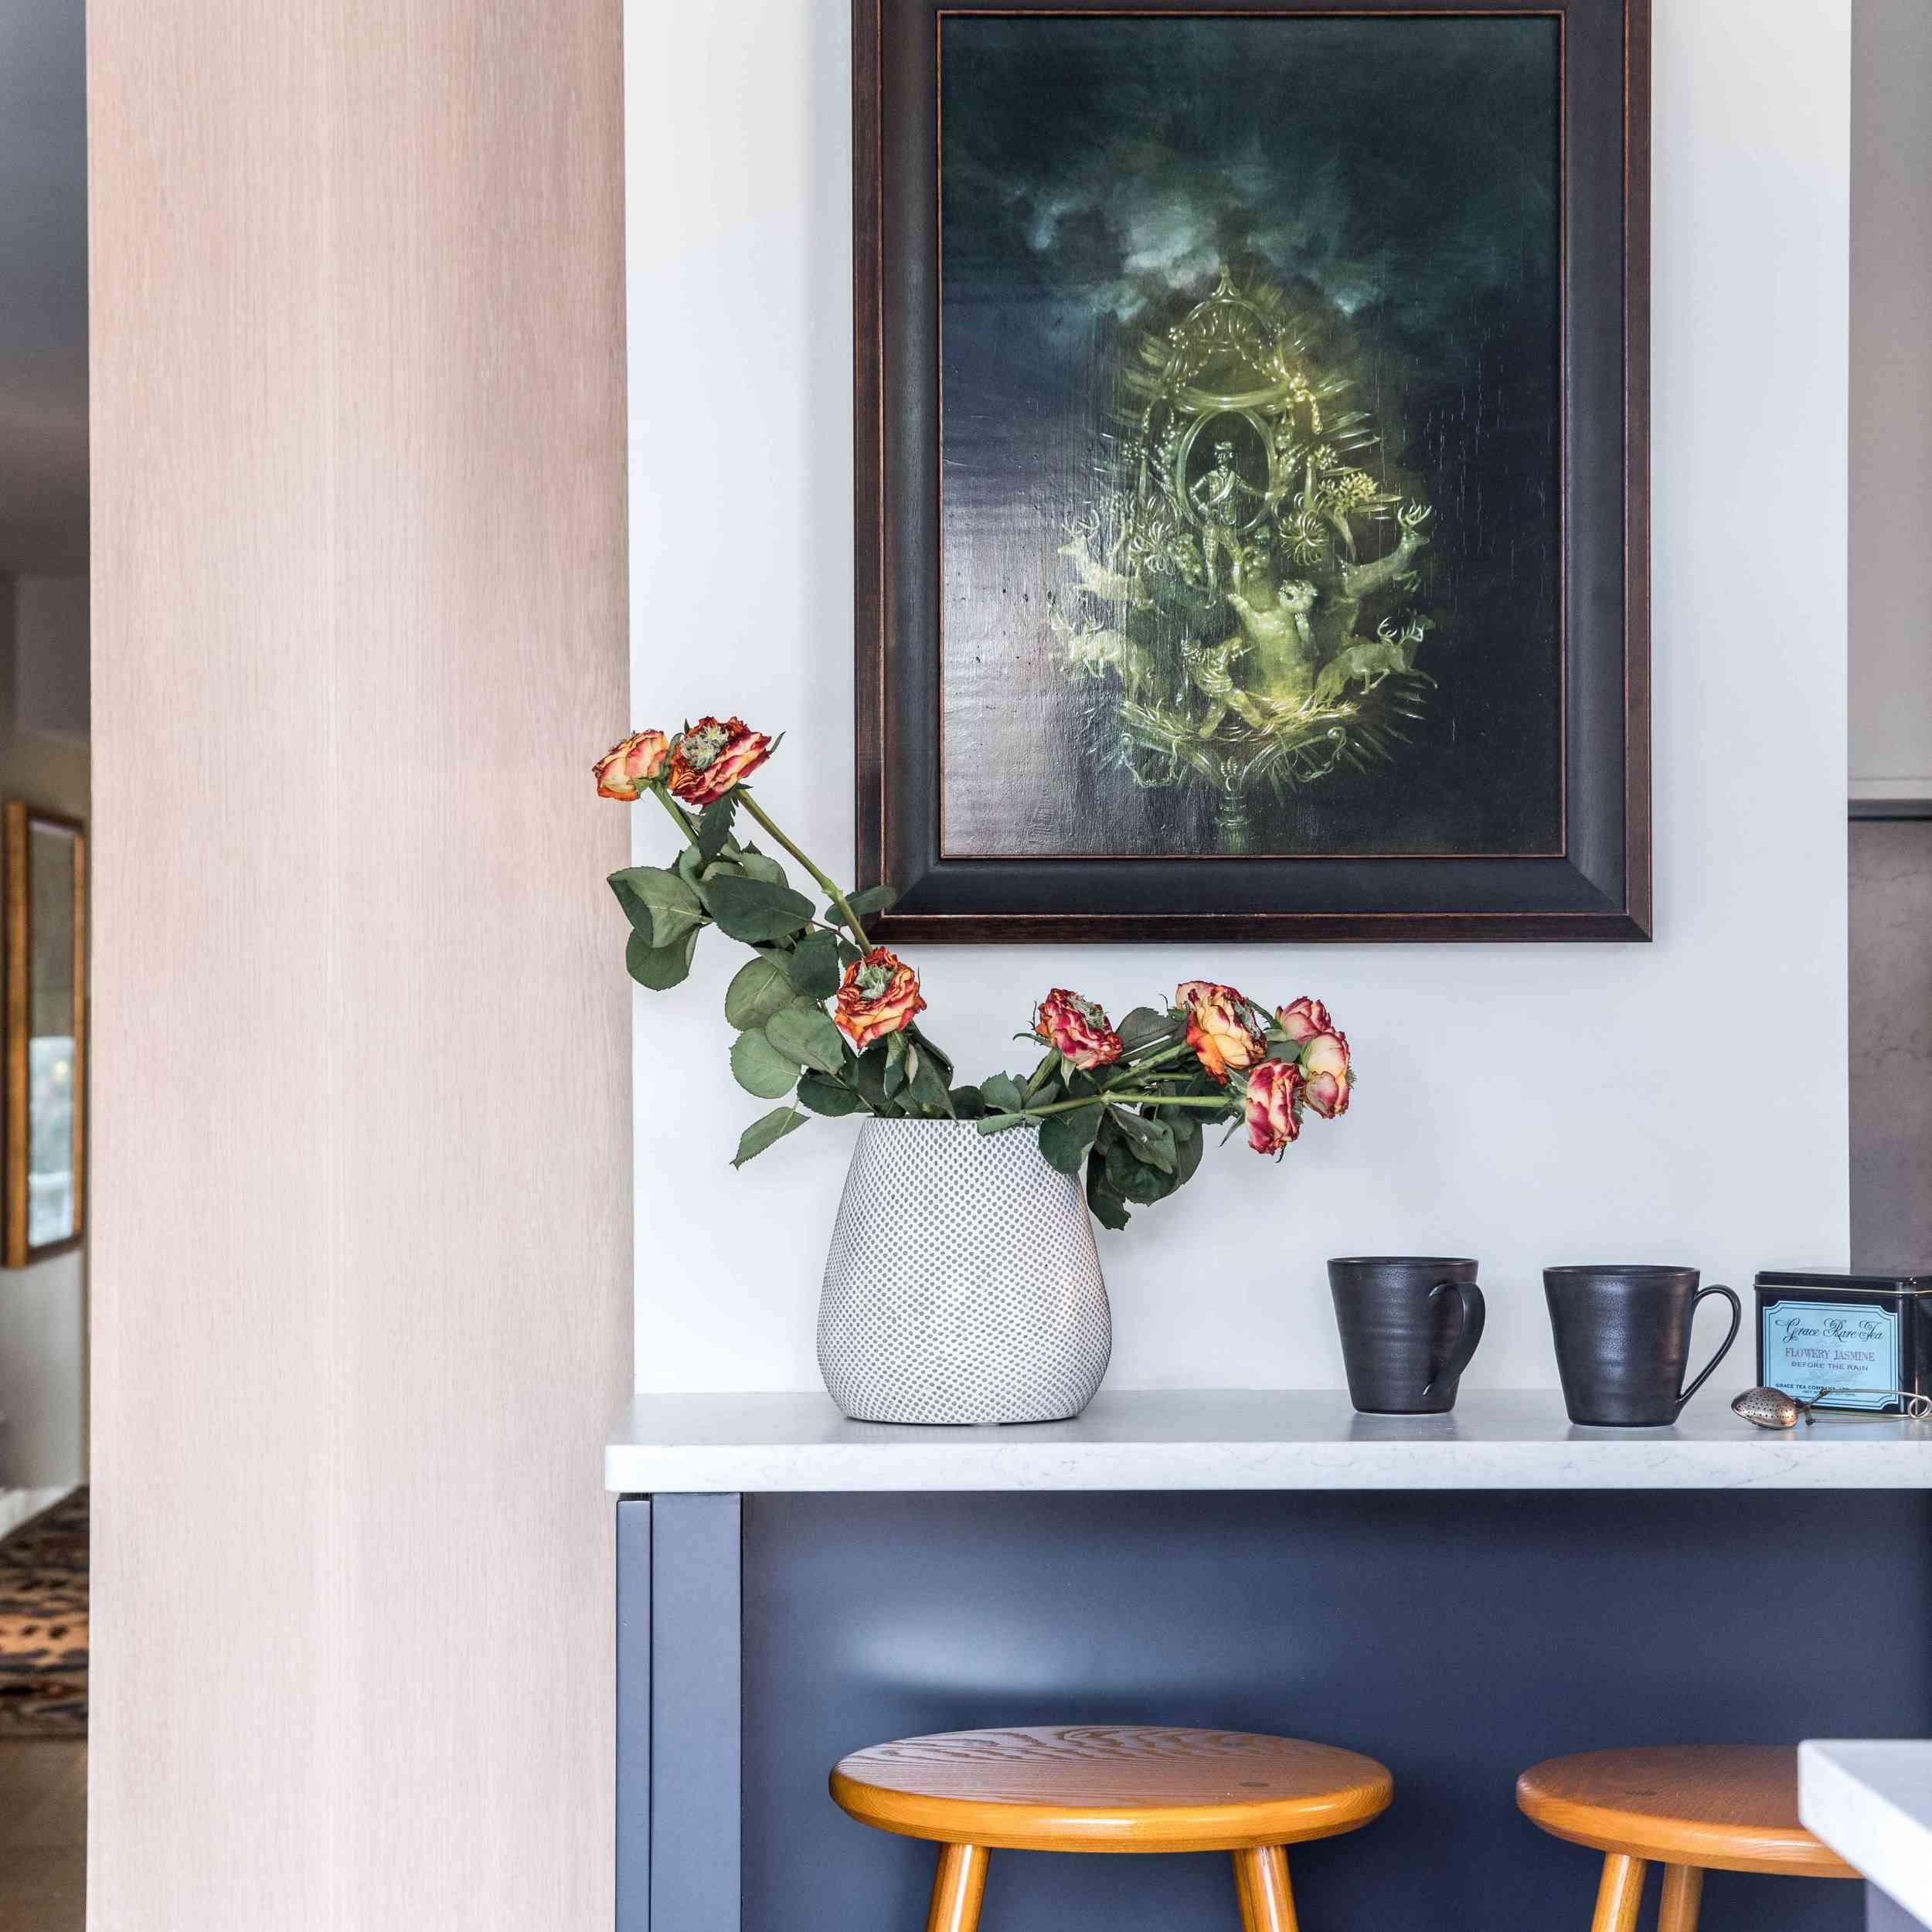 A kitchen with an indigo island